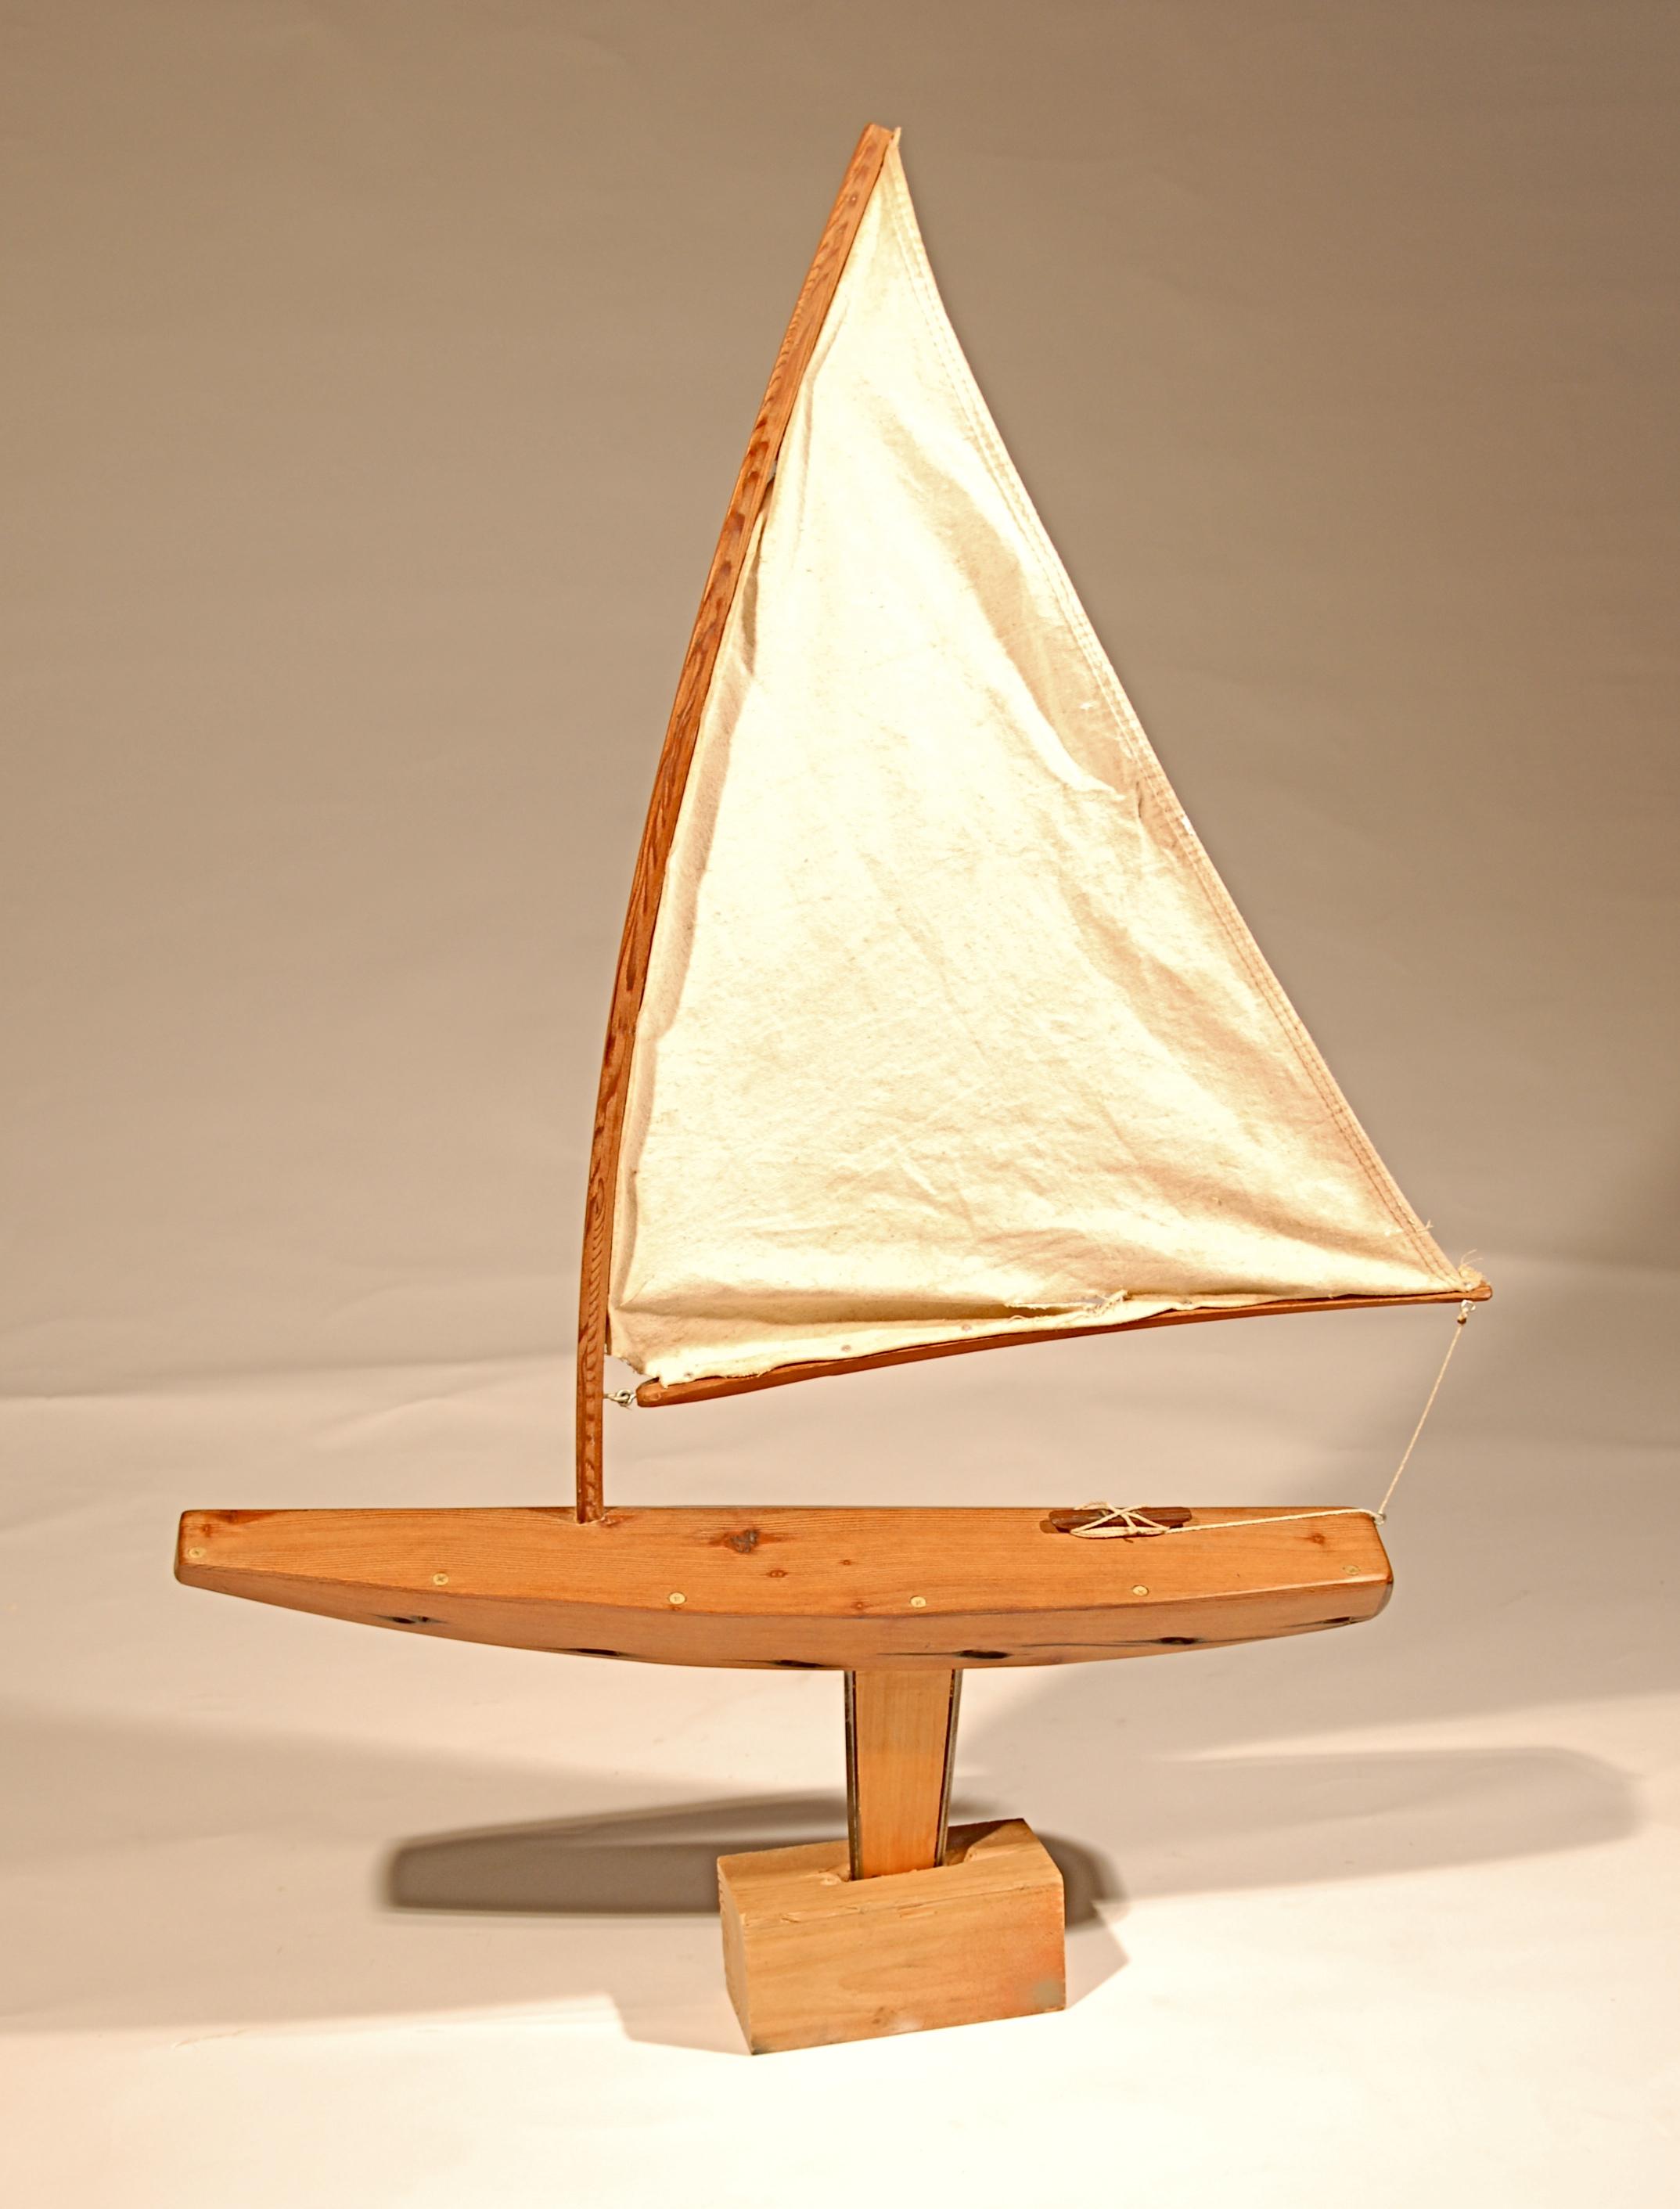 Redwood Sailboat